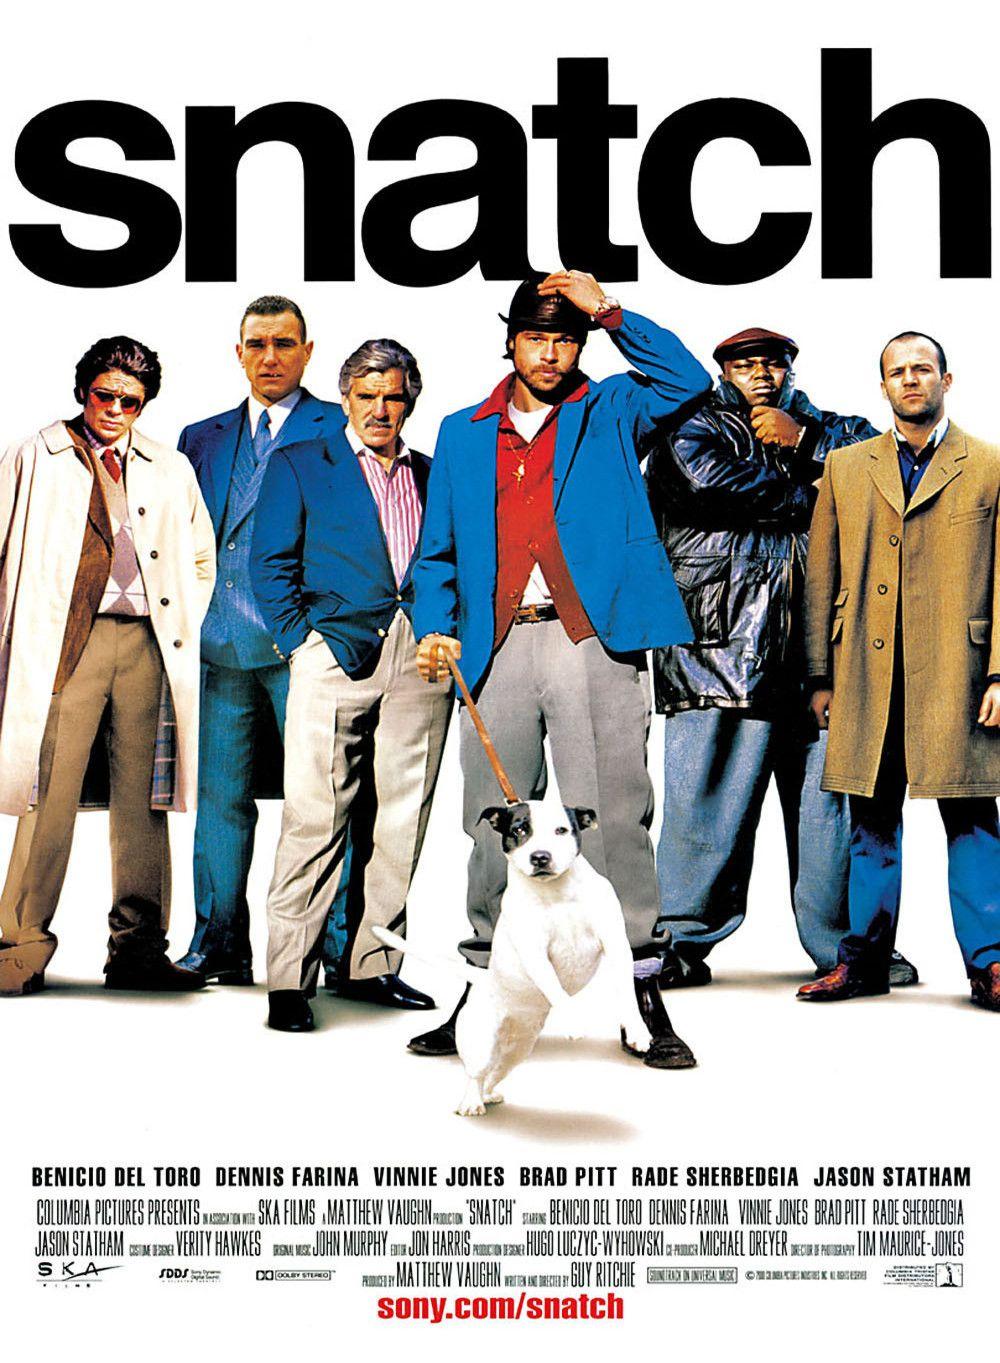 Foursome Assistir inside snatch - film 2000 - allociné | standme | pinterest | films